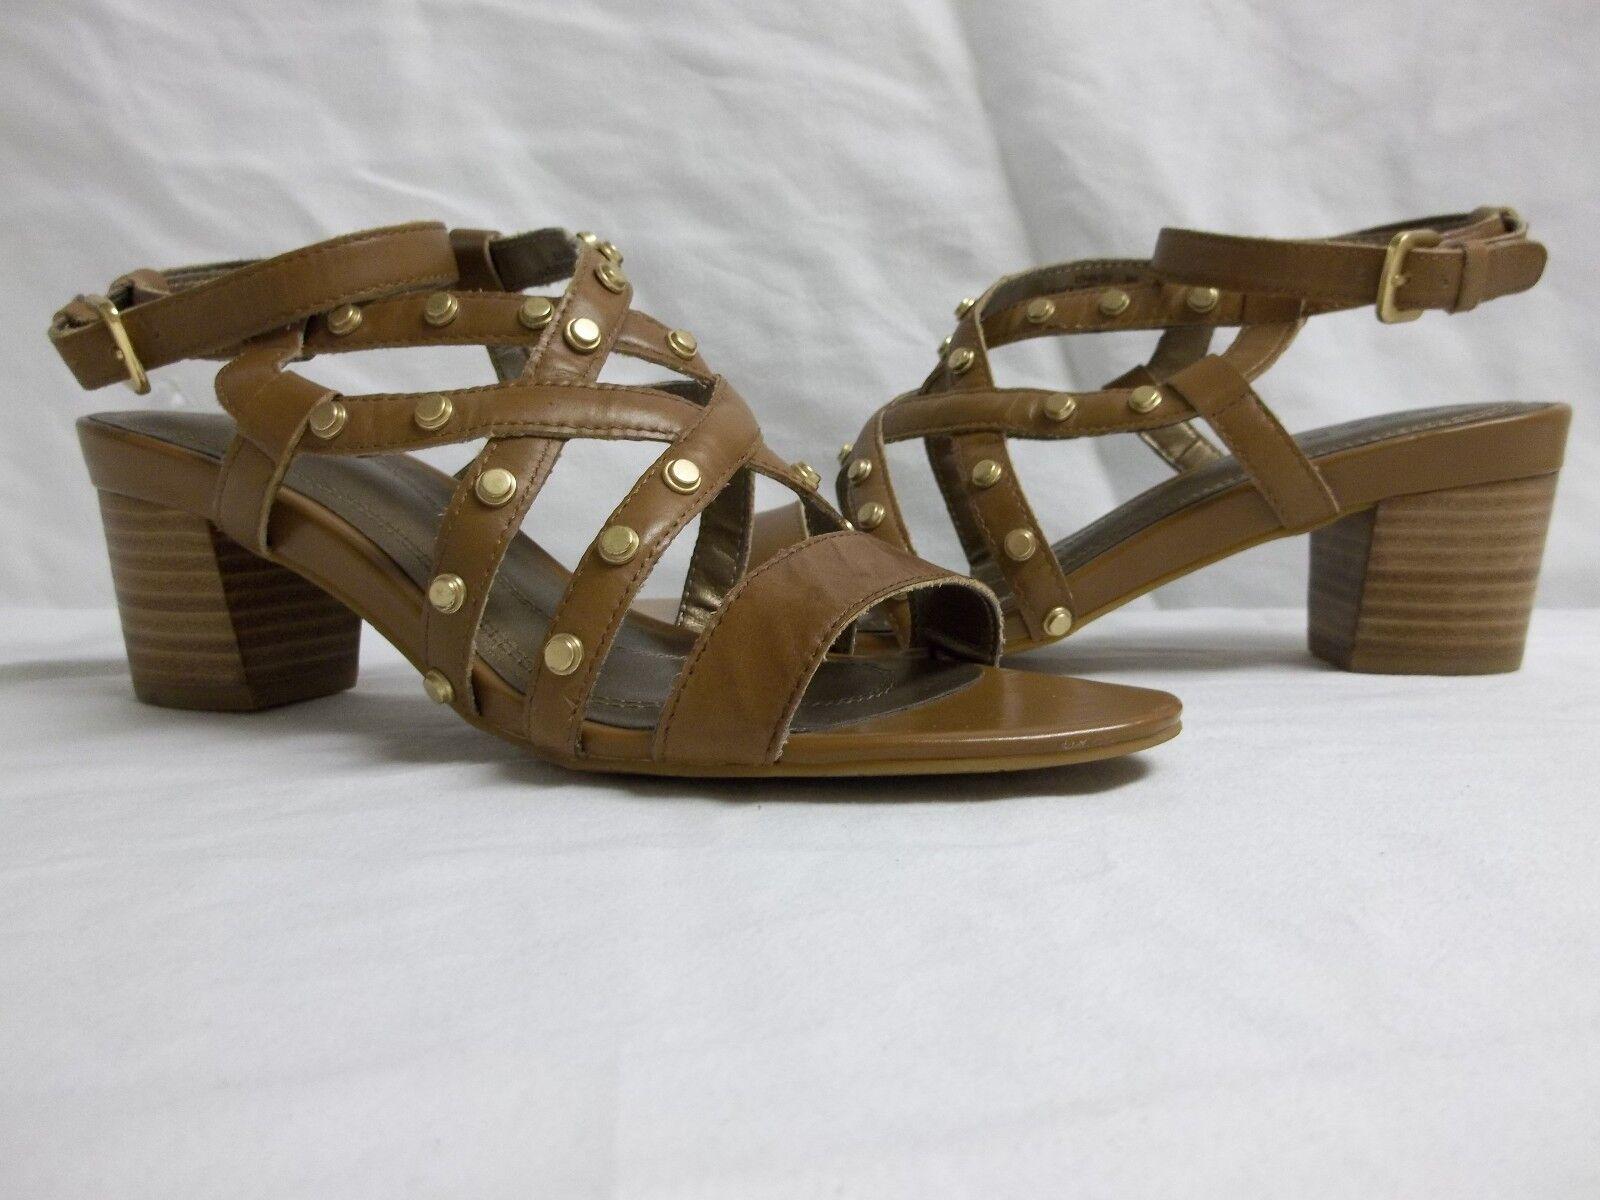 Tahari Sz 8 M Kennedy Butterscotch Leather Open Toe Heels New Womens shoes NWOB